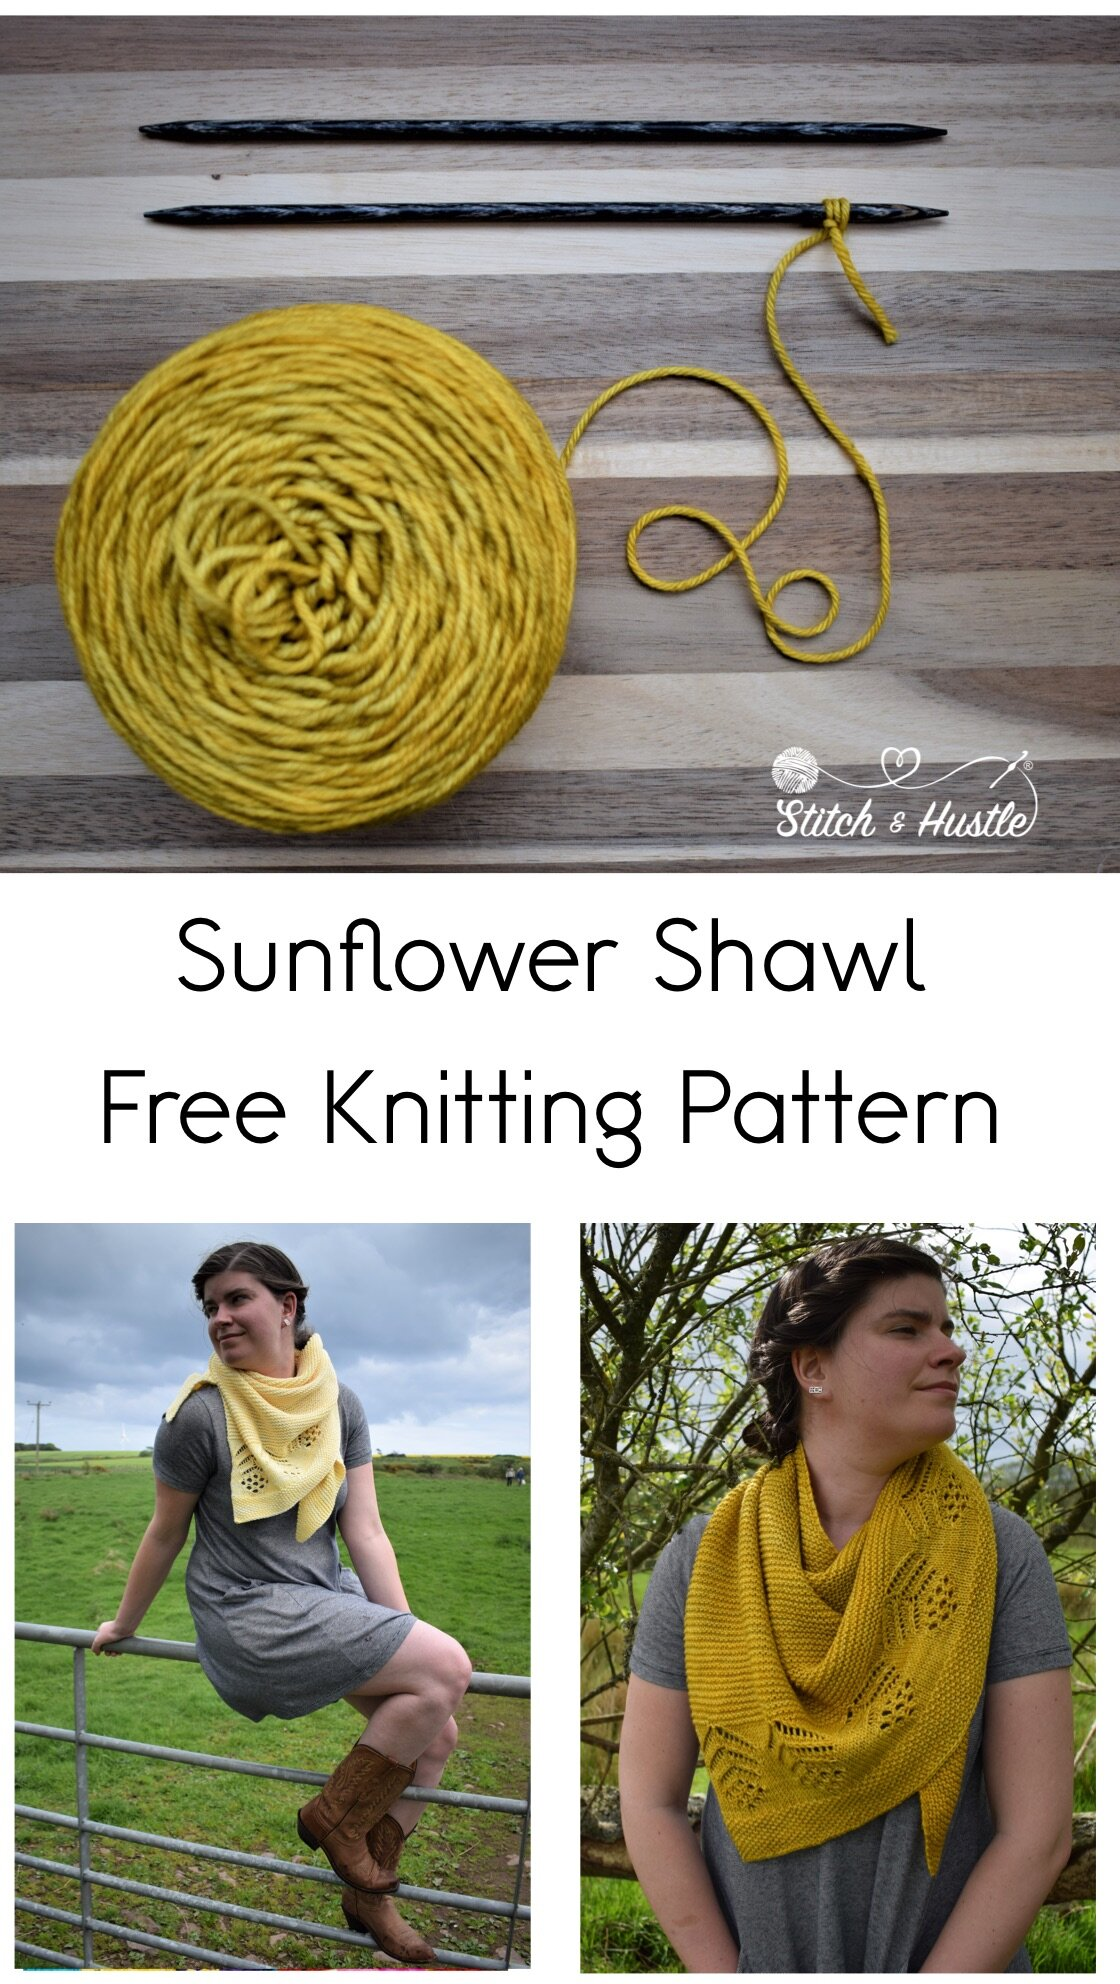 Sunflower_Knit_Shawl_Free_Pattern_6.jpg